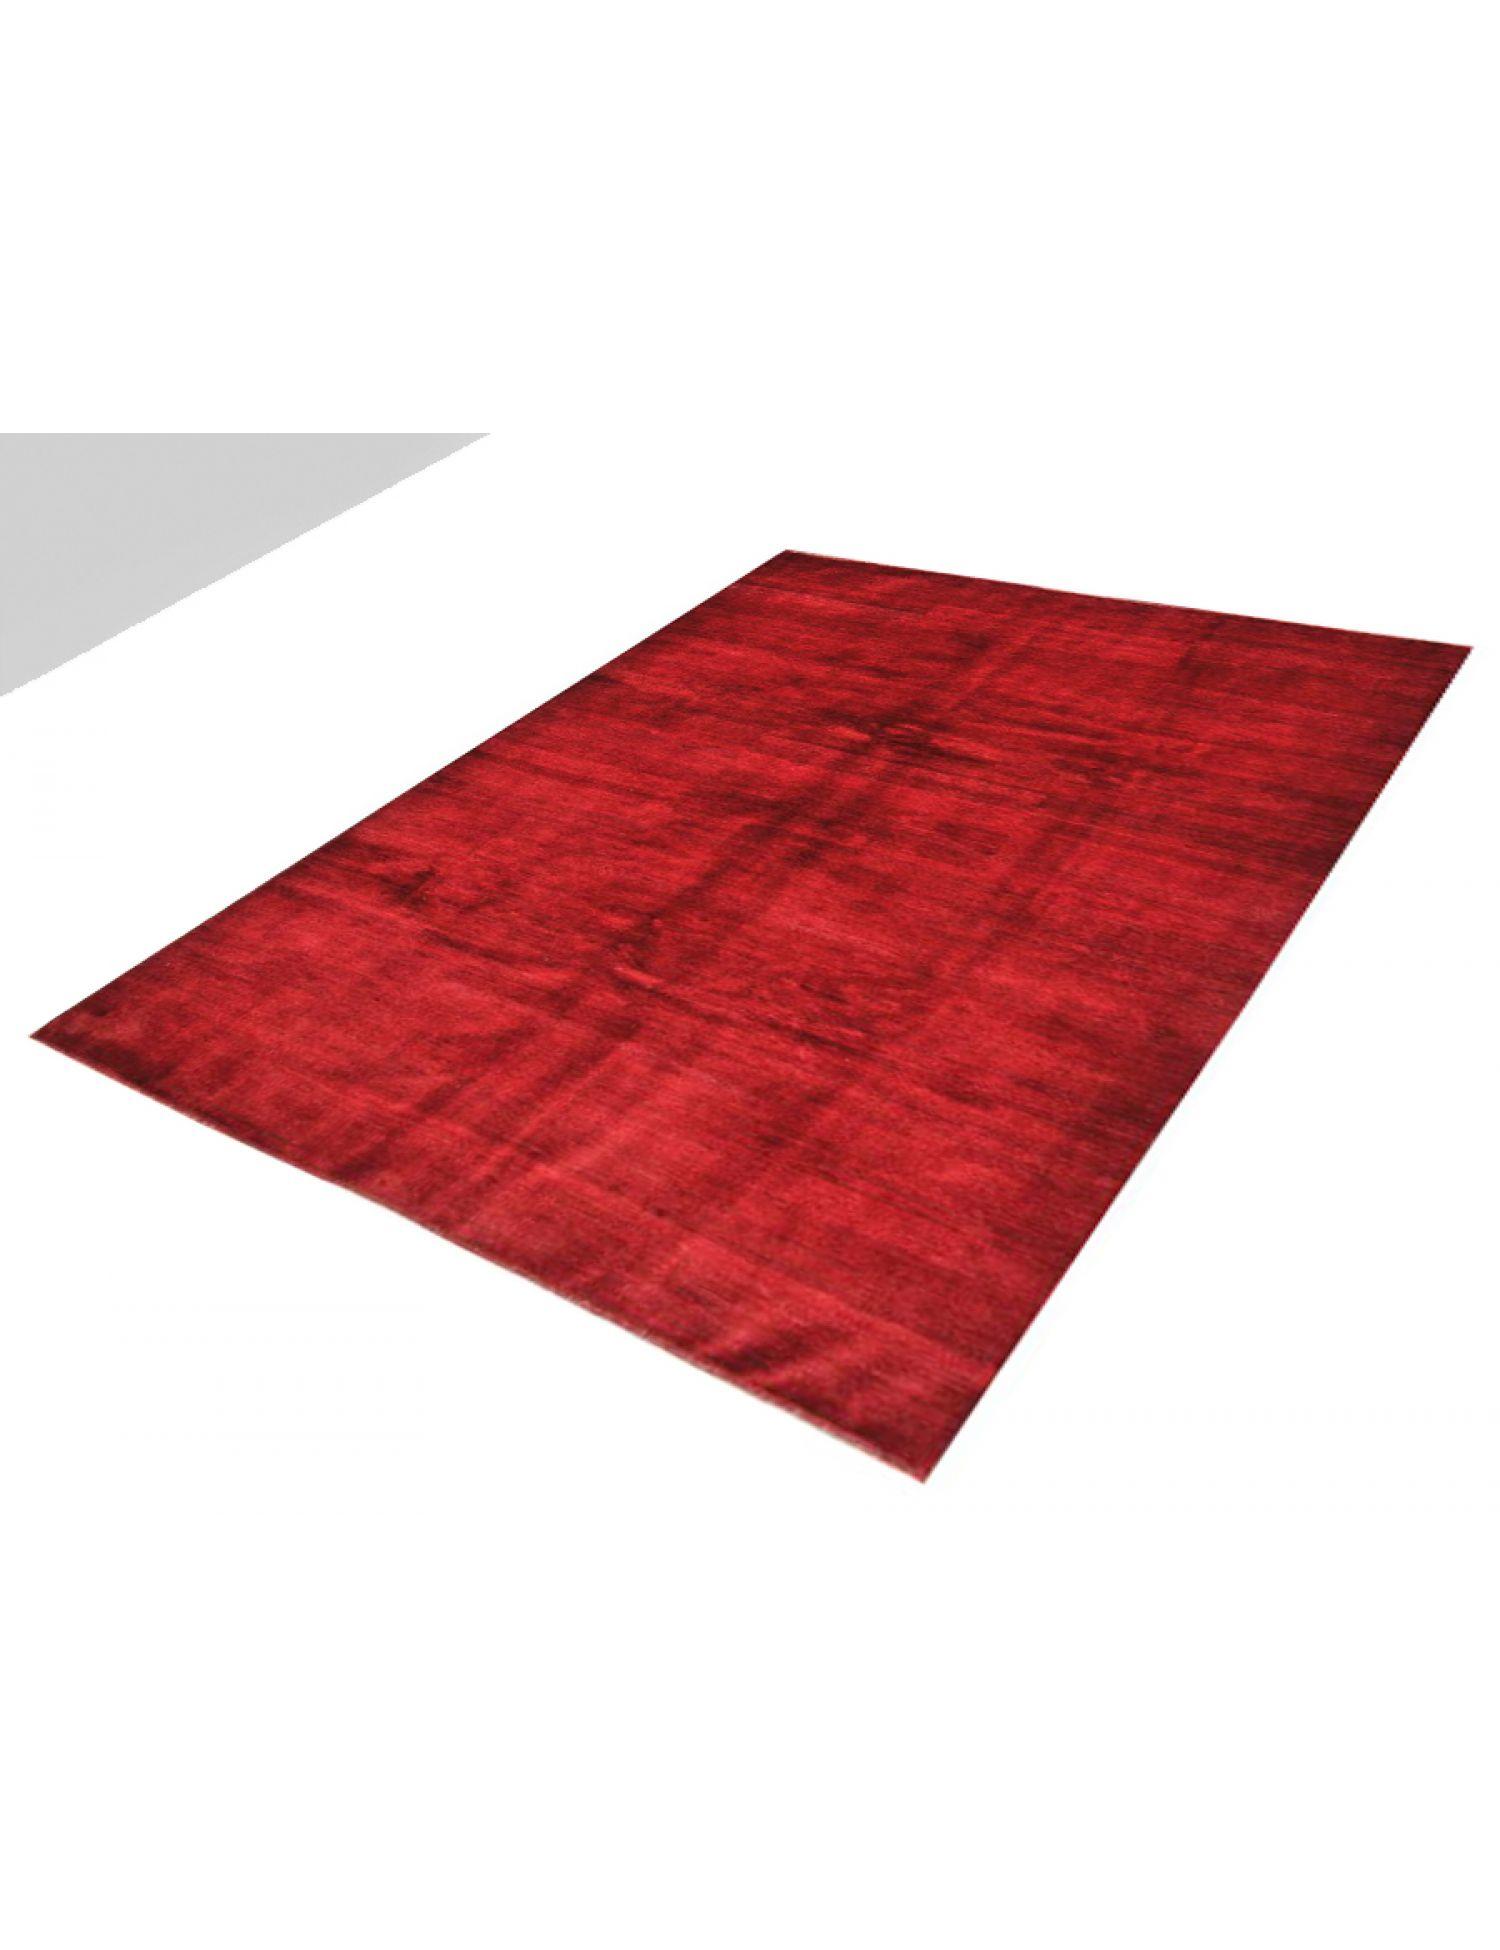 Moderne Teppiche  rot <br/>282 x 197 cm